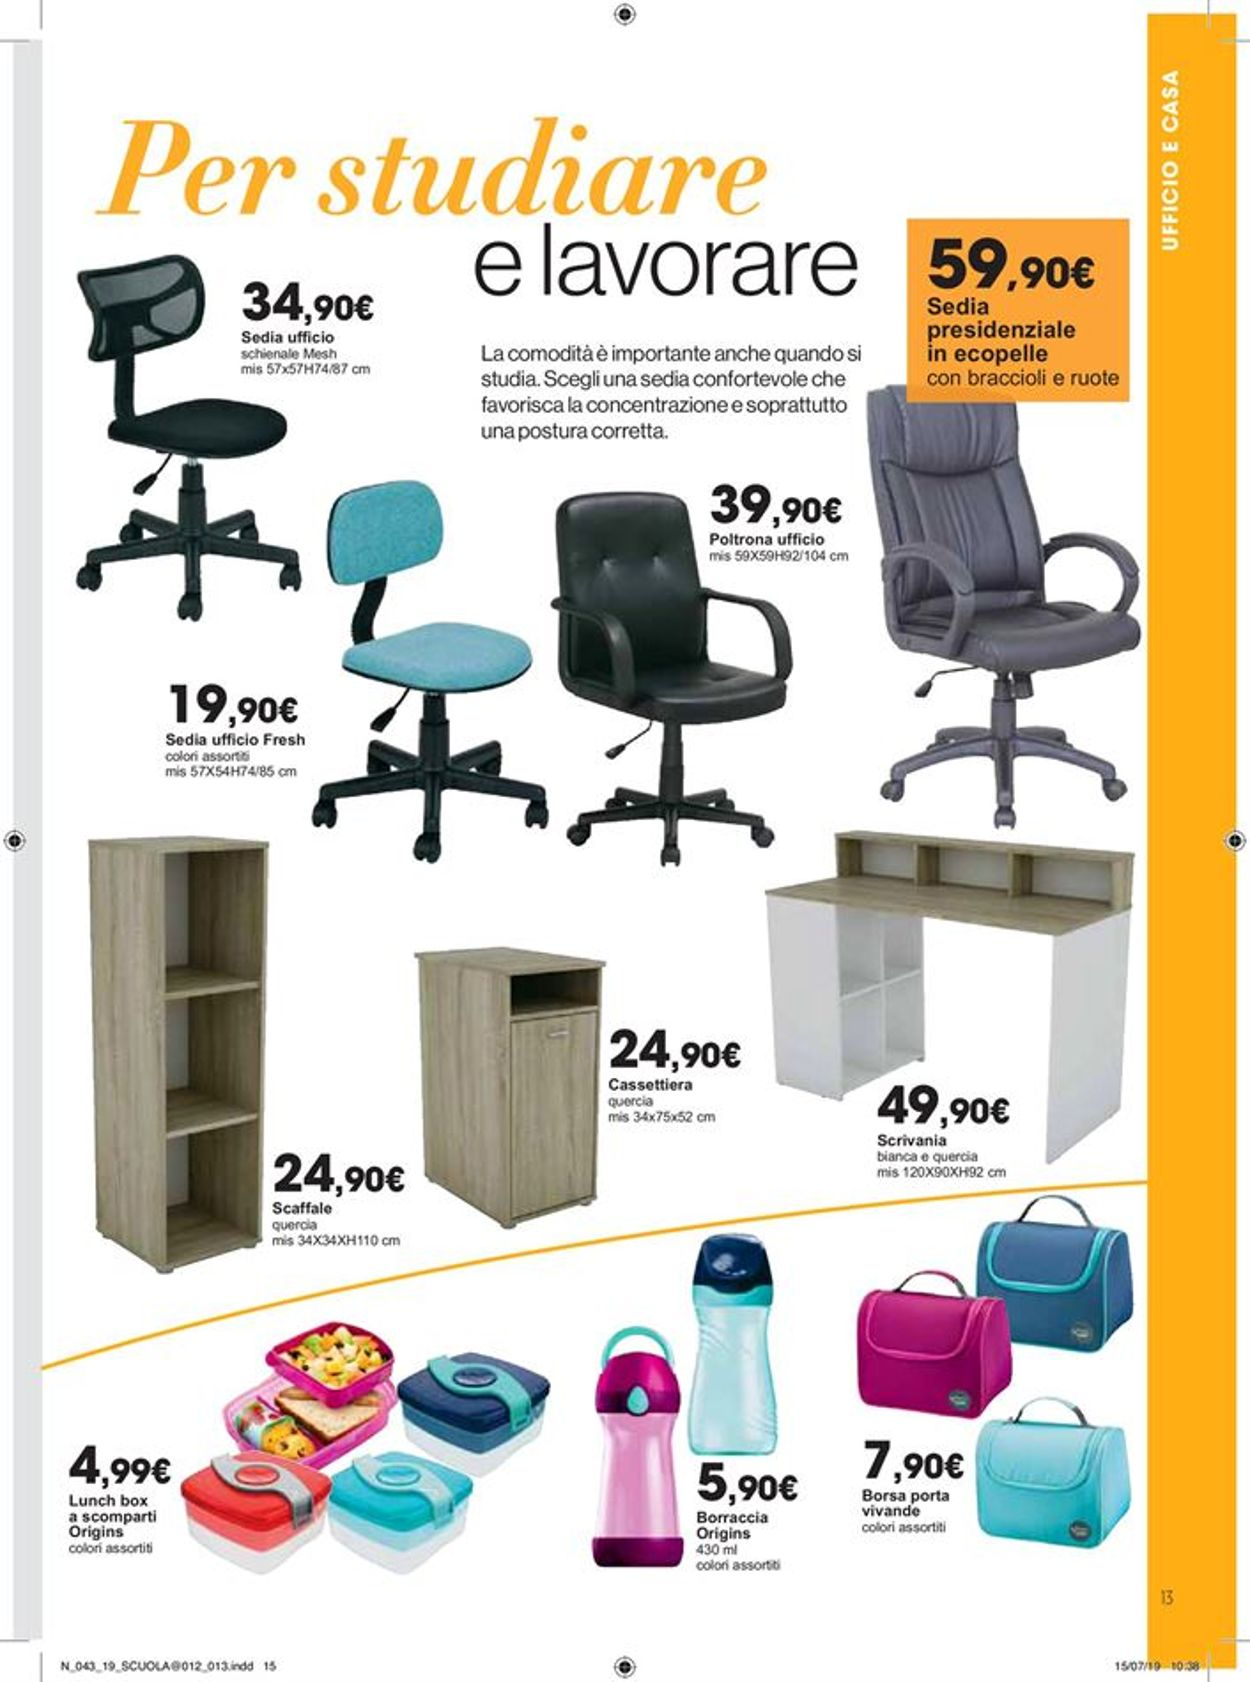 Sedie Da Ufficio Online Carrefour